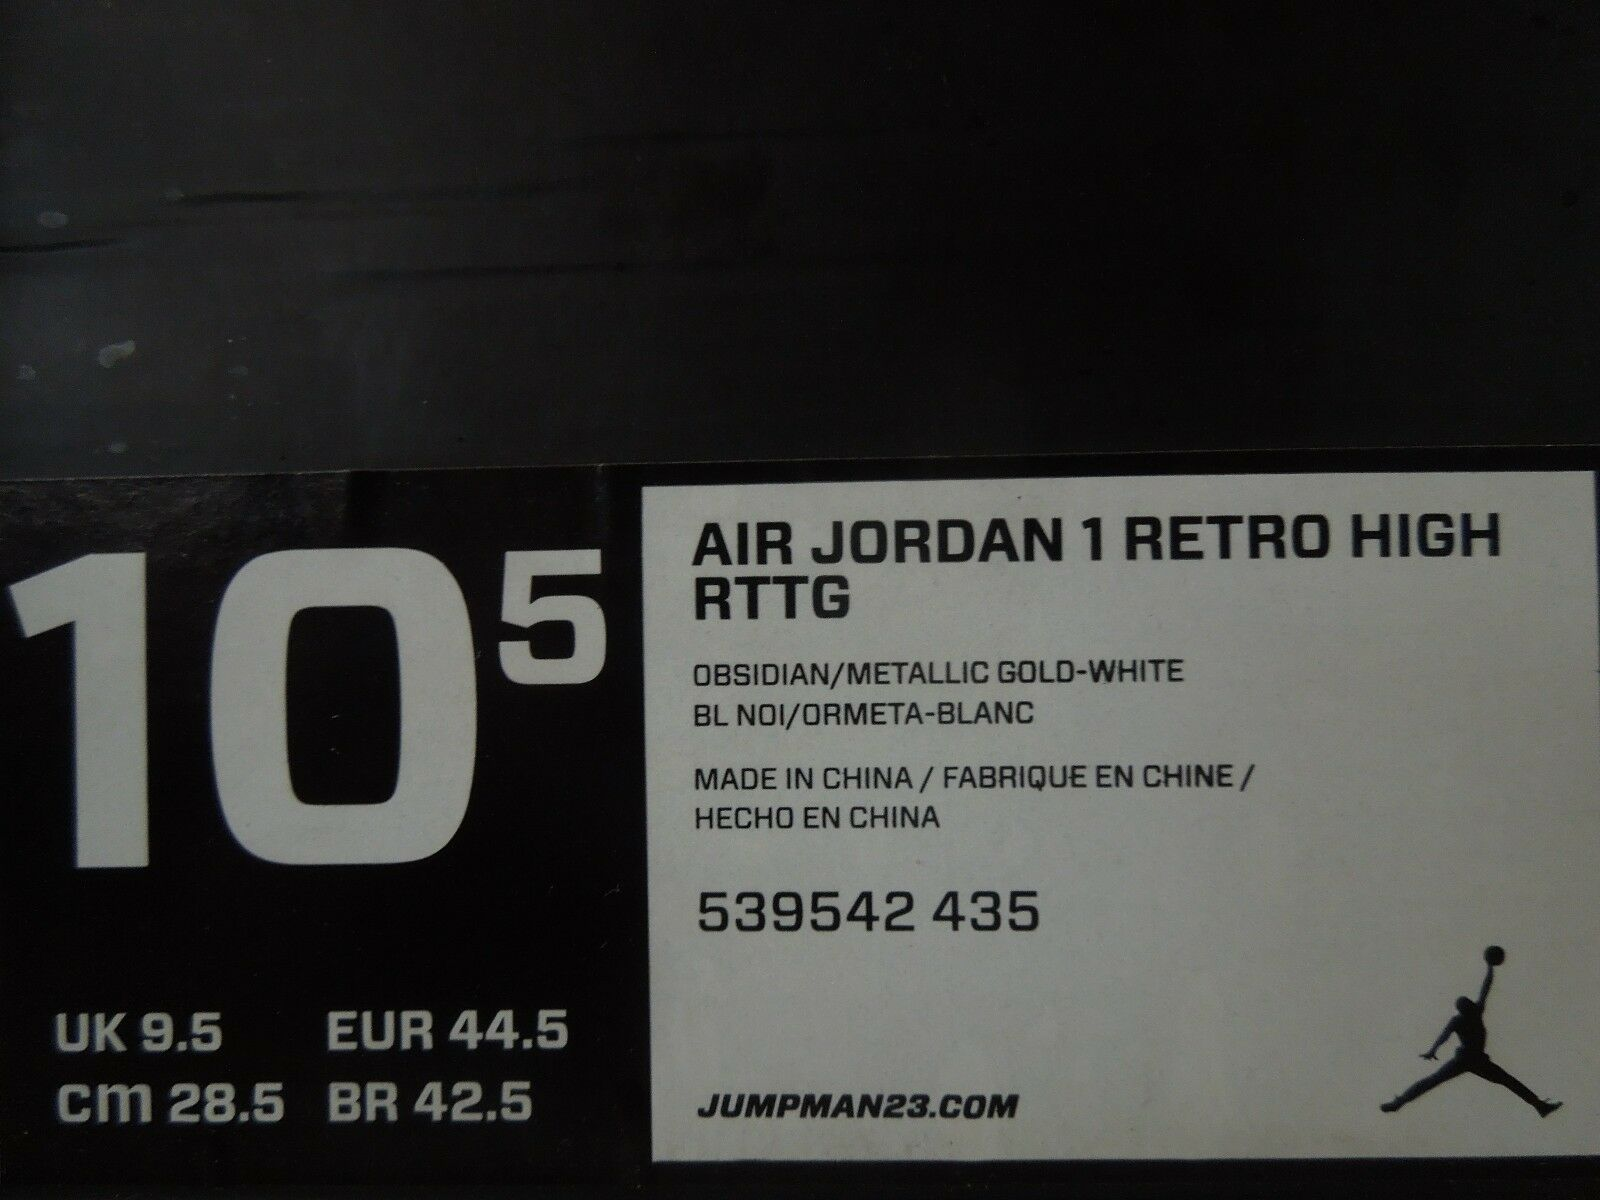 NIKE JORDAN 1 RETRO Alta DC AIR AIR DC RTTG LAS VEGAS camino de oro [539542-435] ad0894